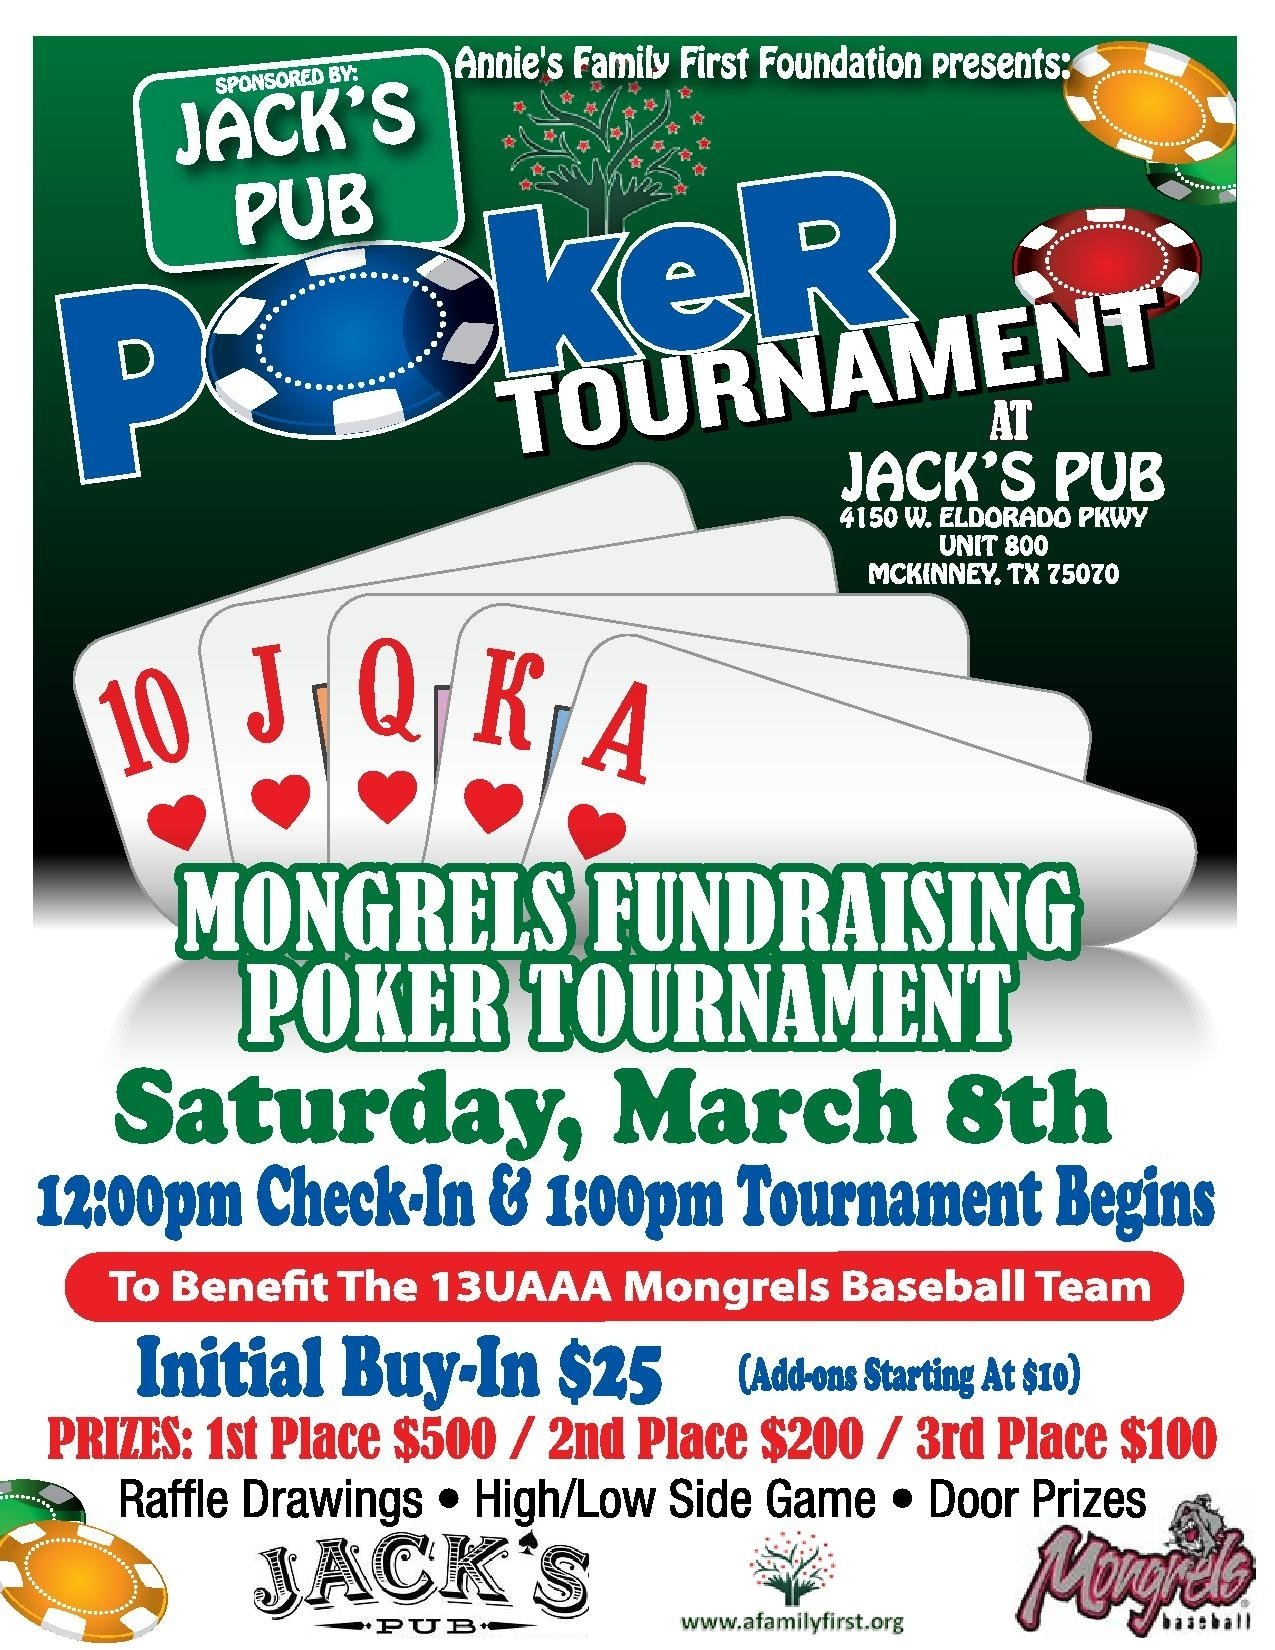 10 Cute Fundraising Ideas For Baseball Teams poker fundraising tournament benefitting the 13uaaa mckinney 2020